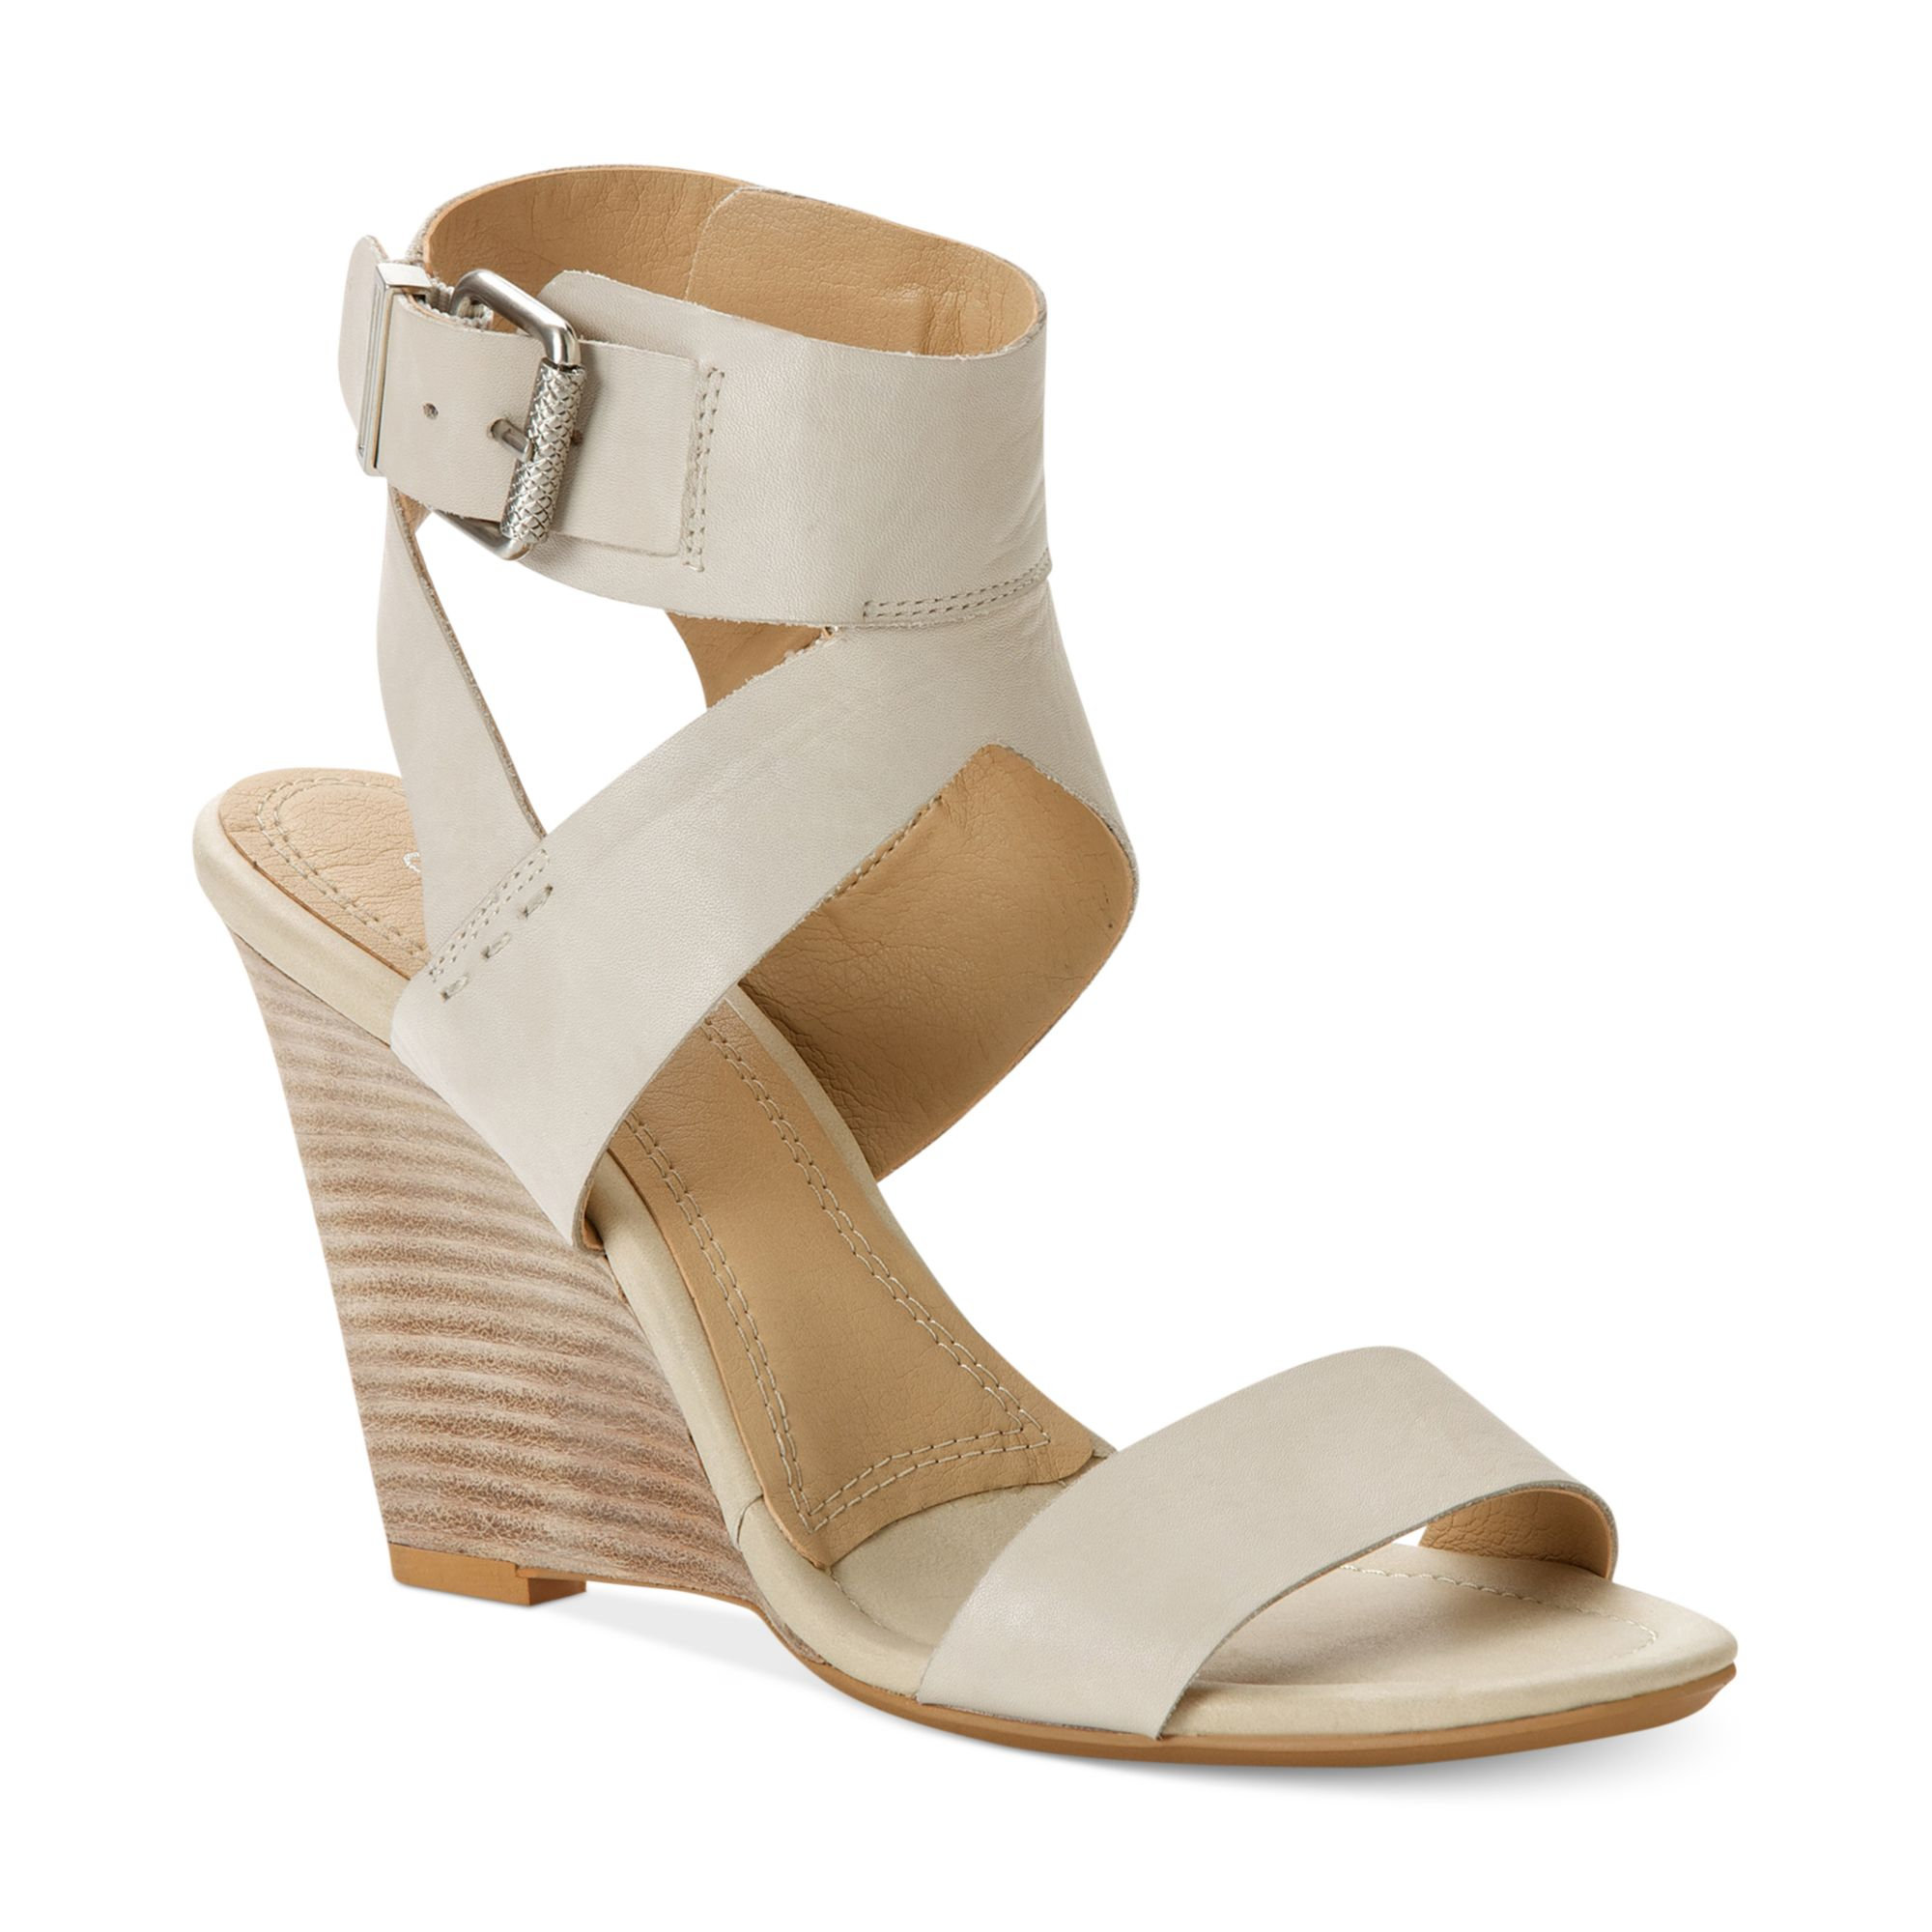 Calvin Klein Ck Jeans Womens Maisi Wedge Sandals in White ...